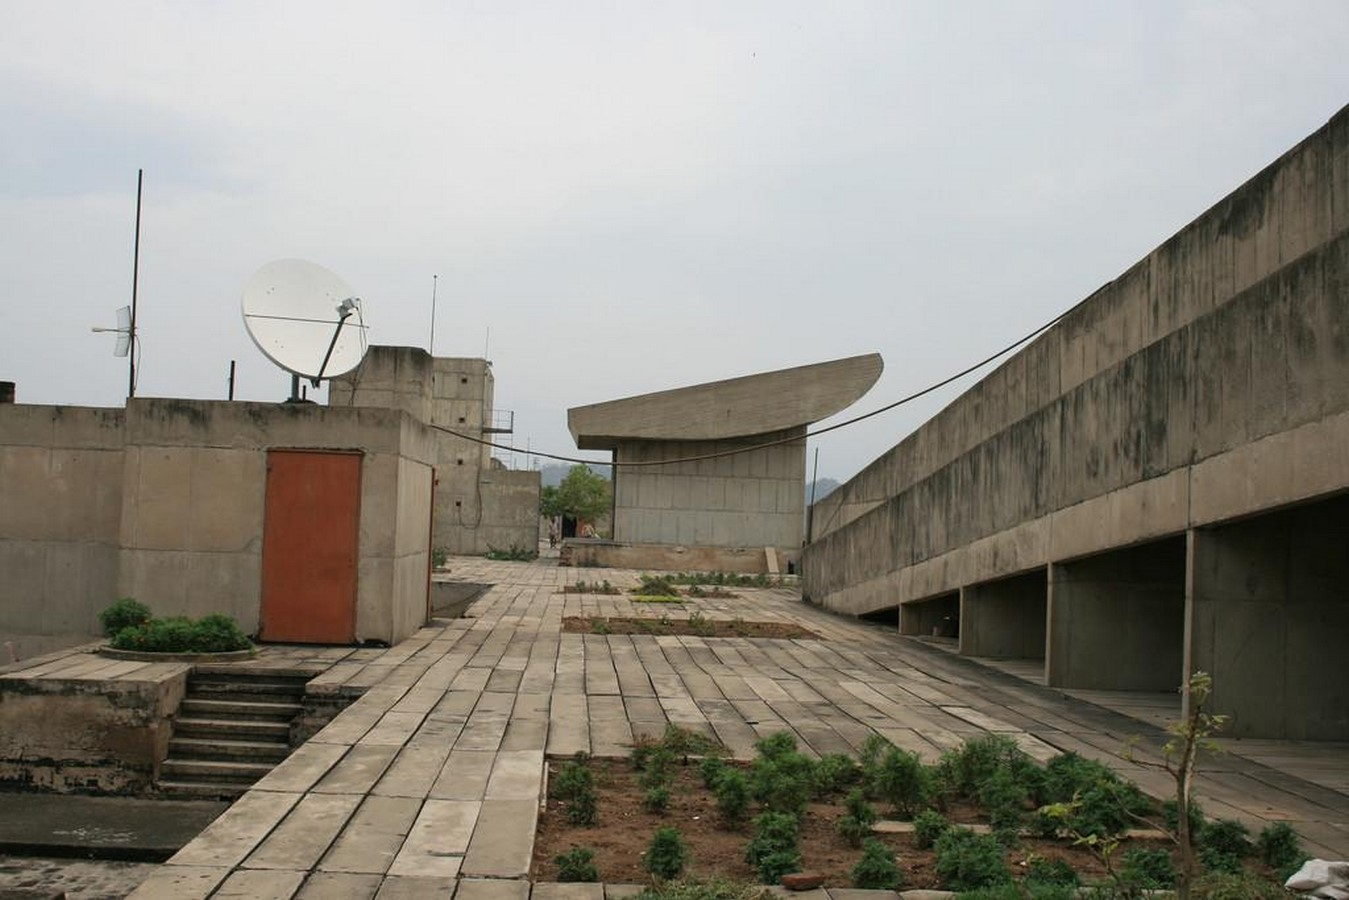 Chandigarh Secretariat - Sheet2